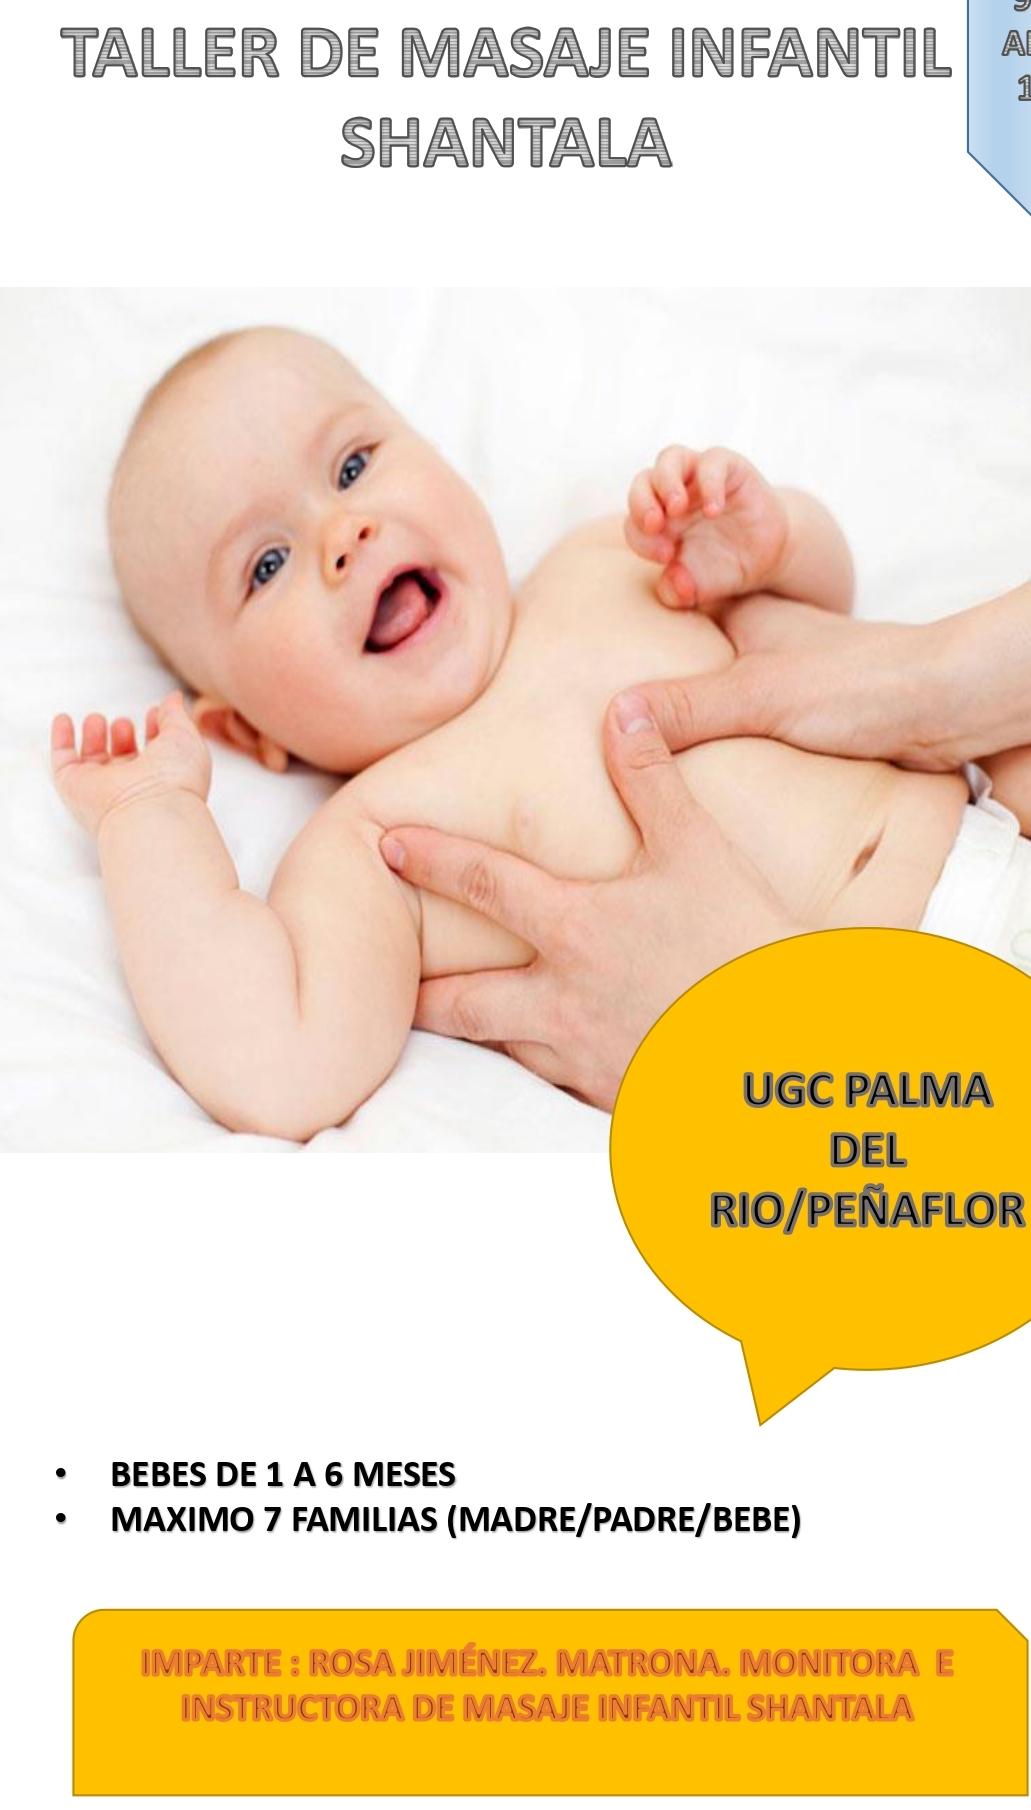 https://www.palmadelrio.es/sites/default/files/poster_masaje_2_page-0001.jpg